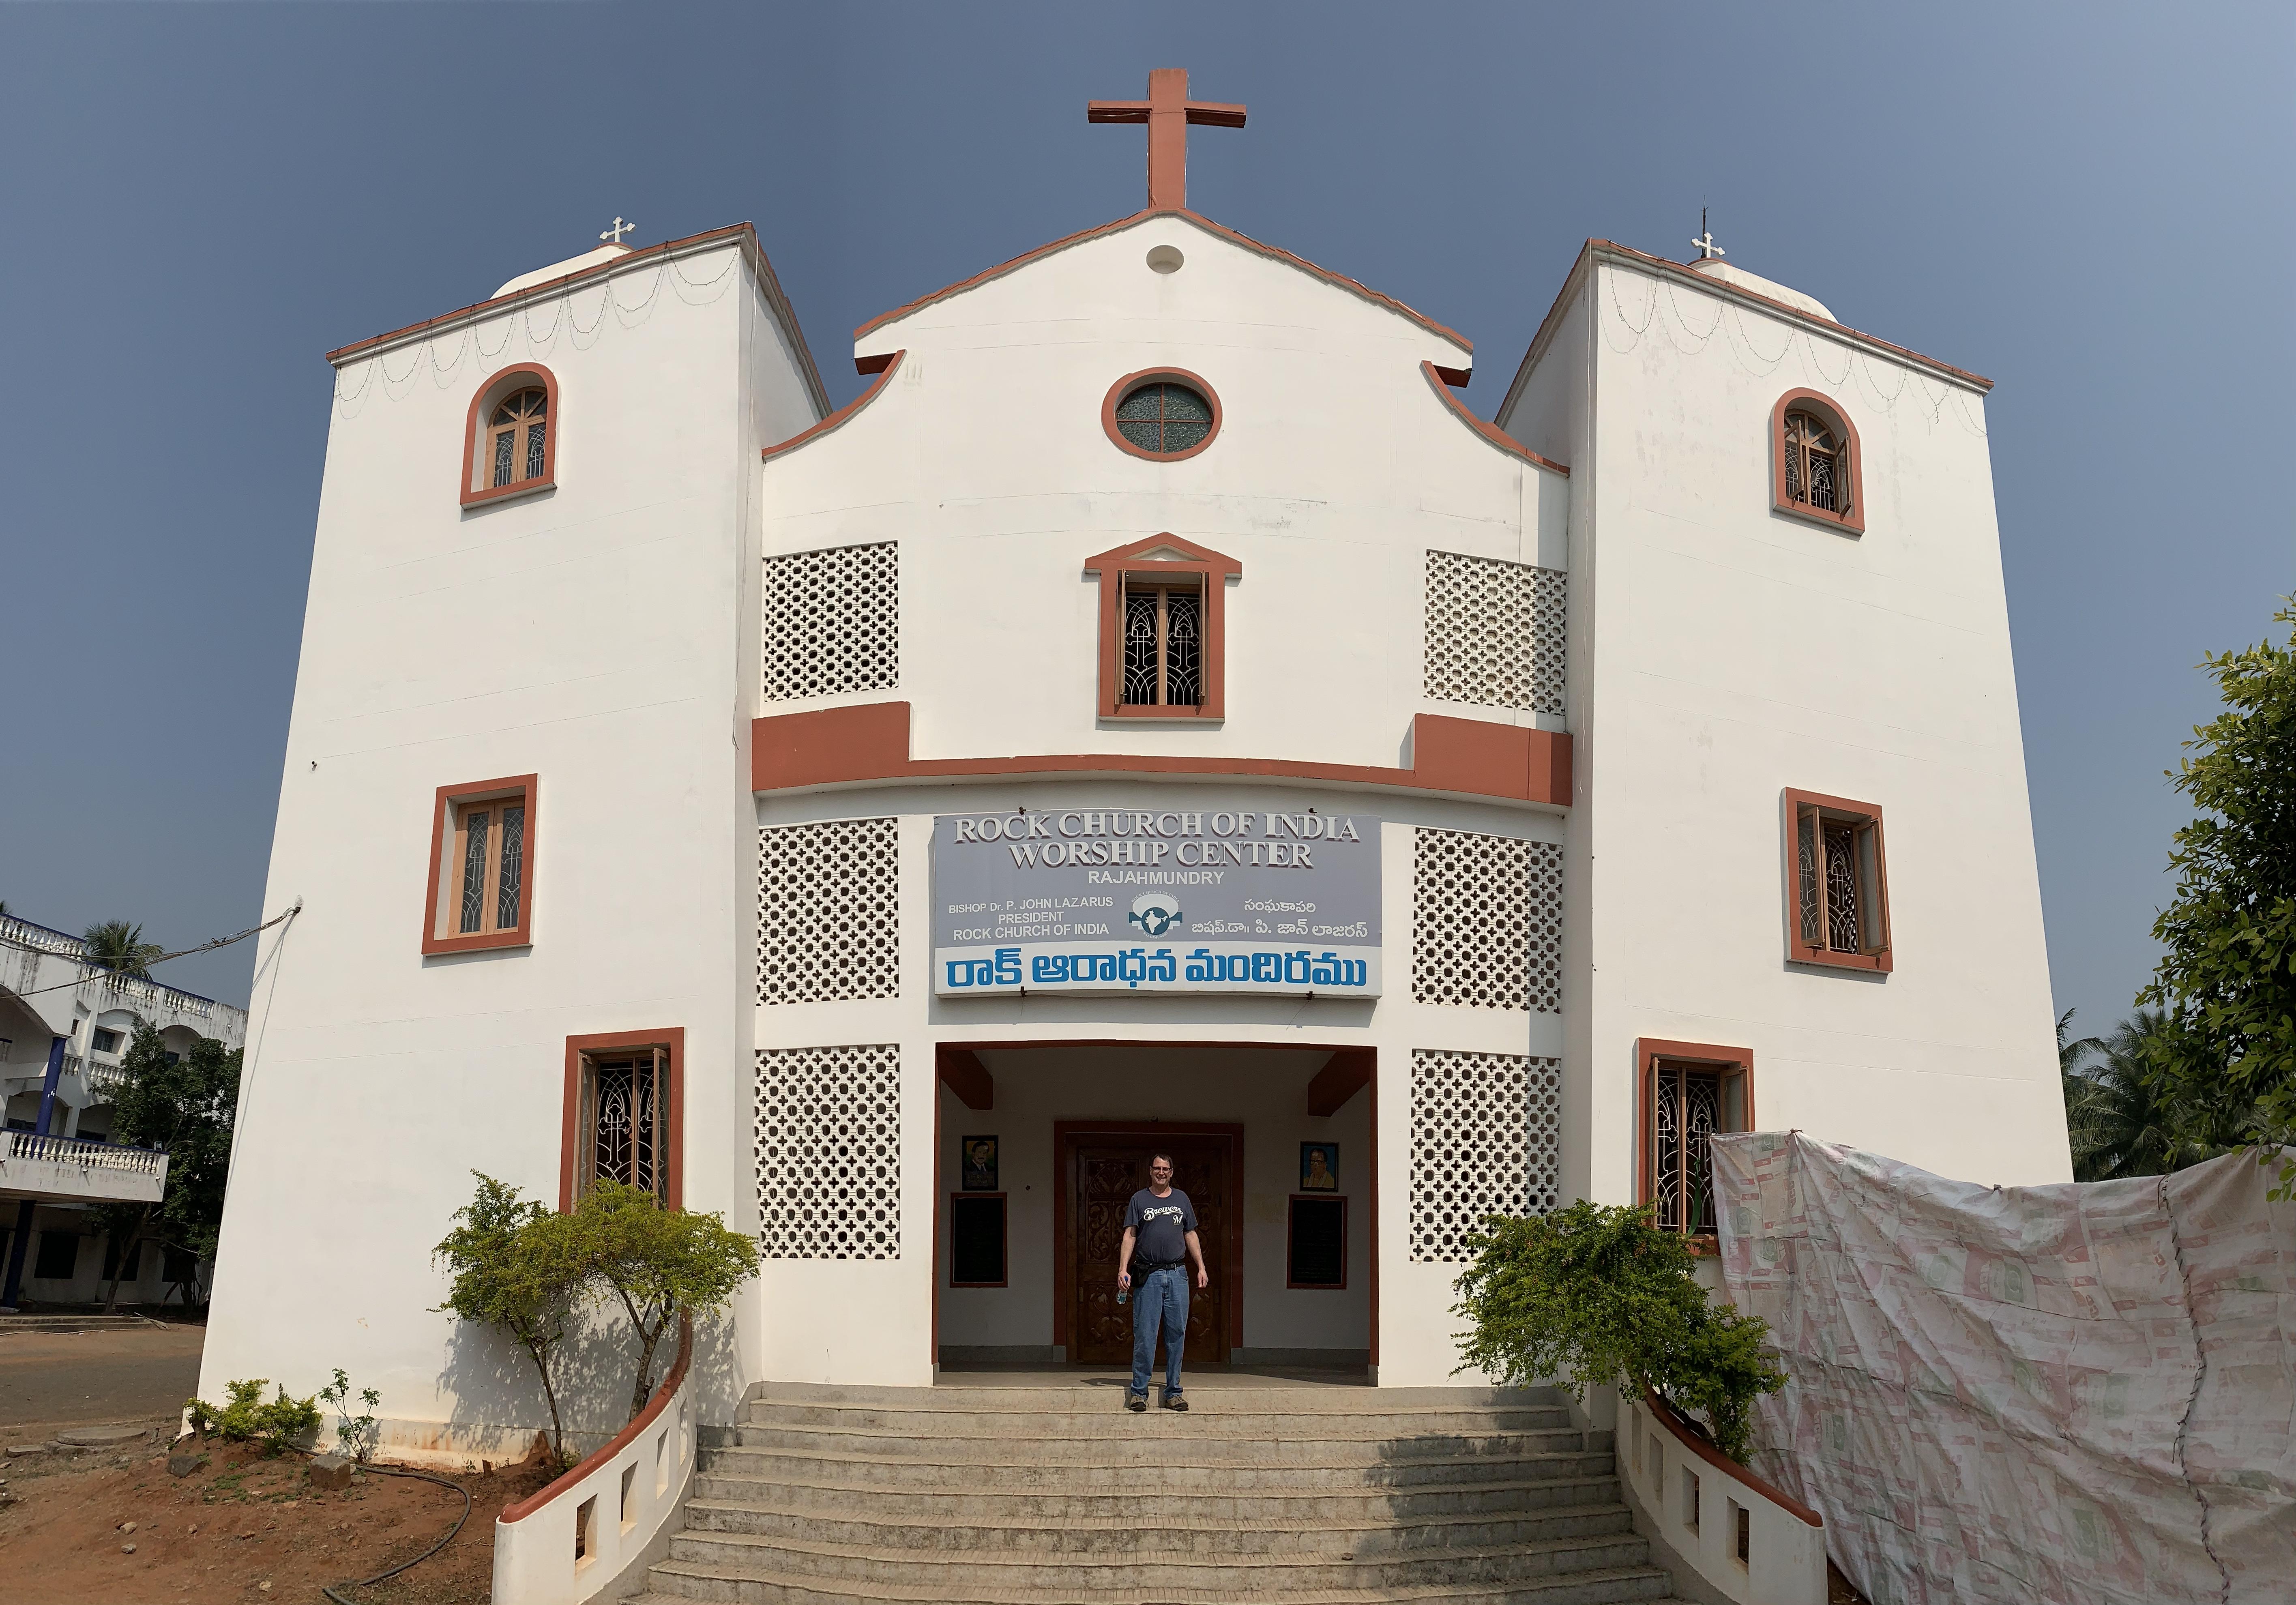 Rock Church of India